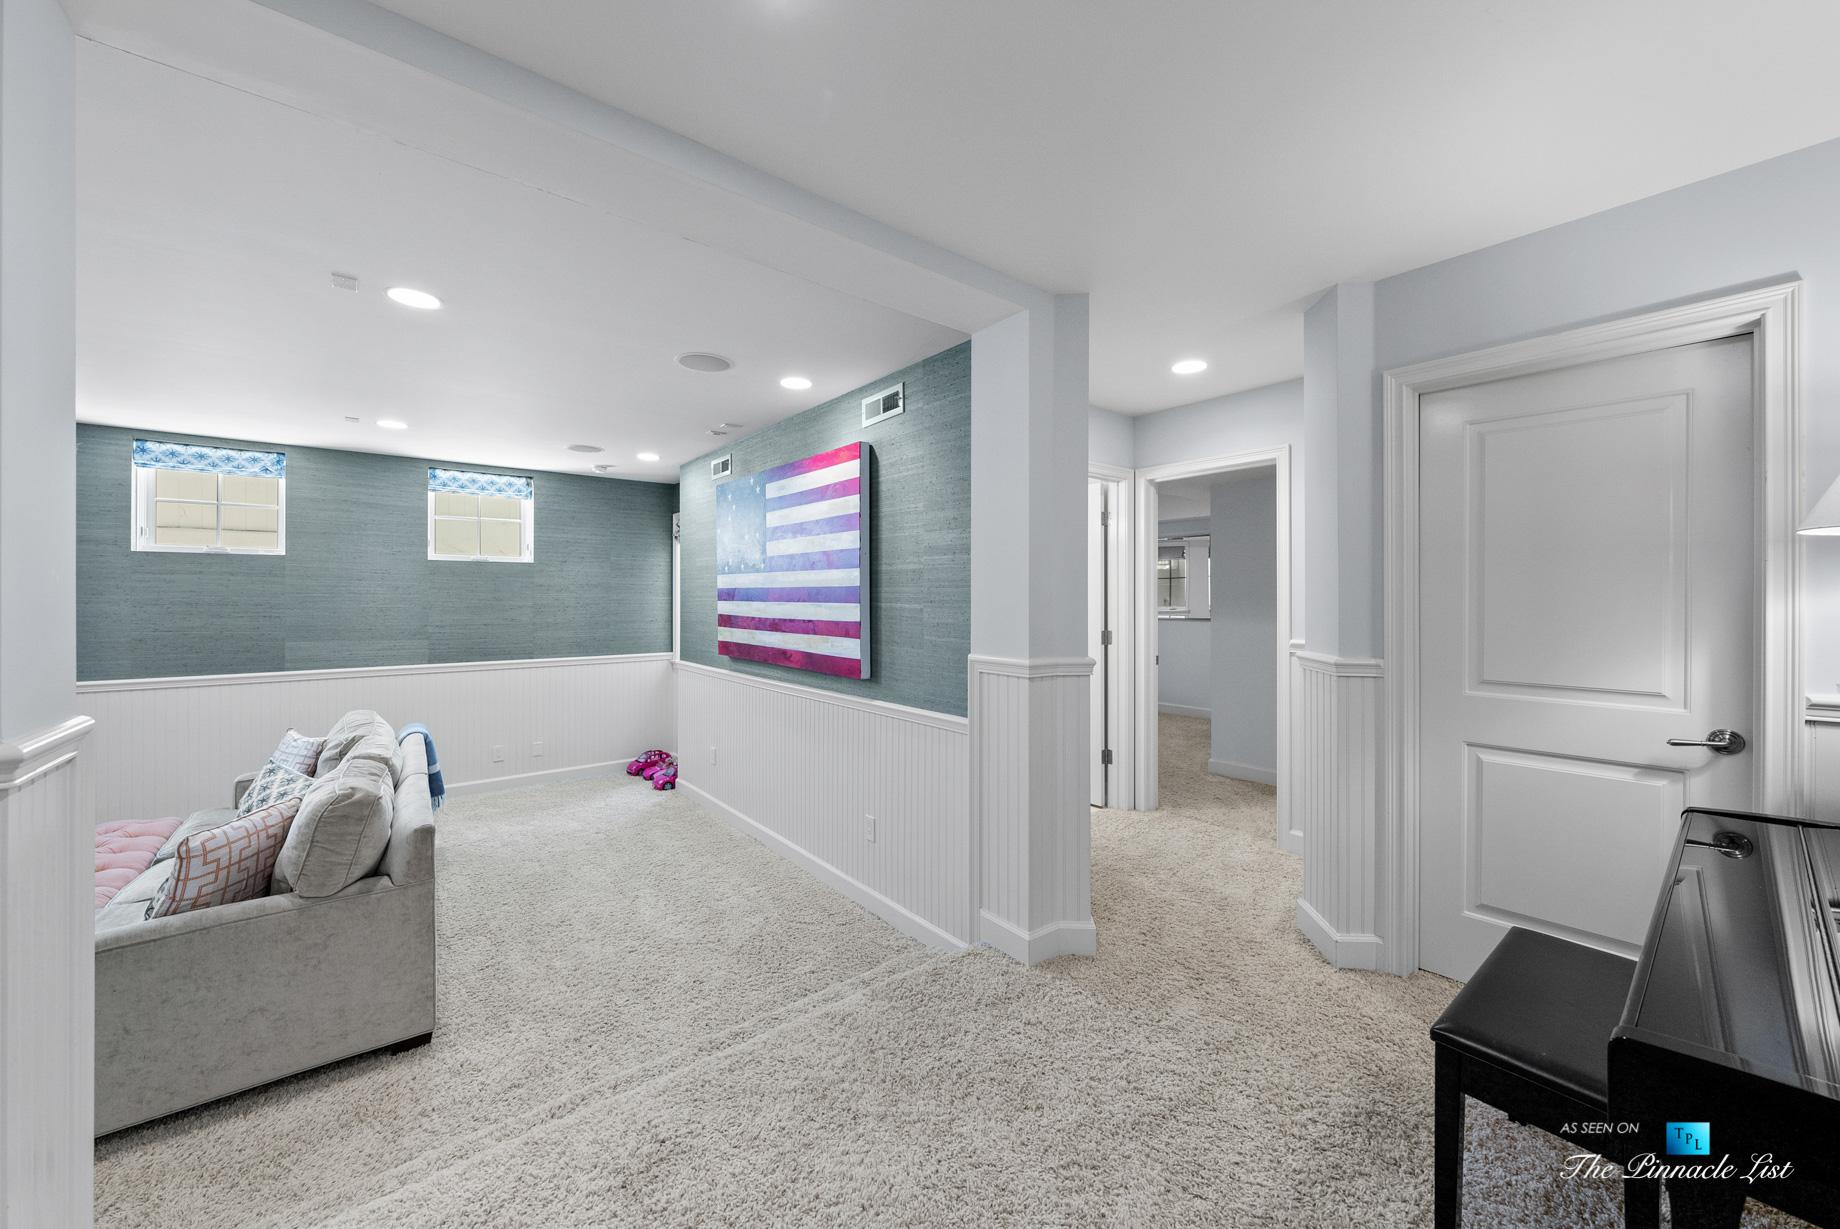 877 8th Street, Manhattan Beach, CA, USA - Basement Recreation Room